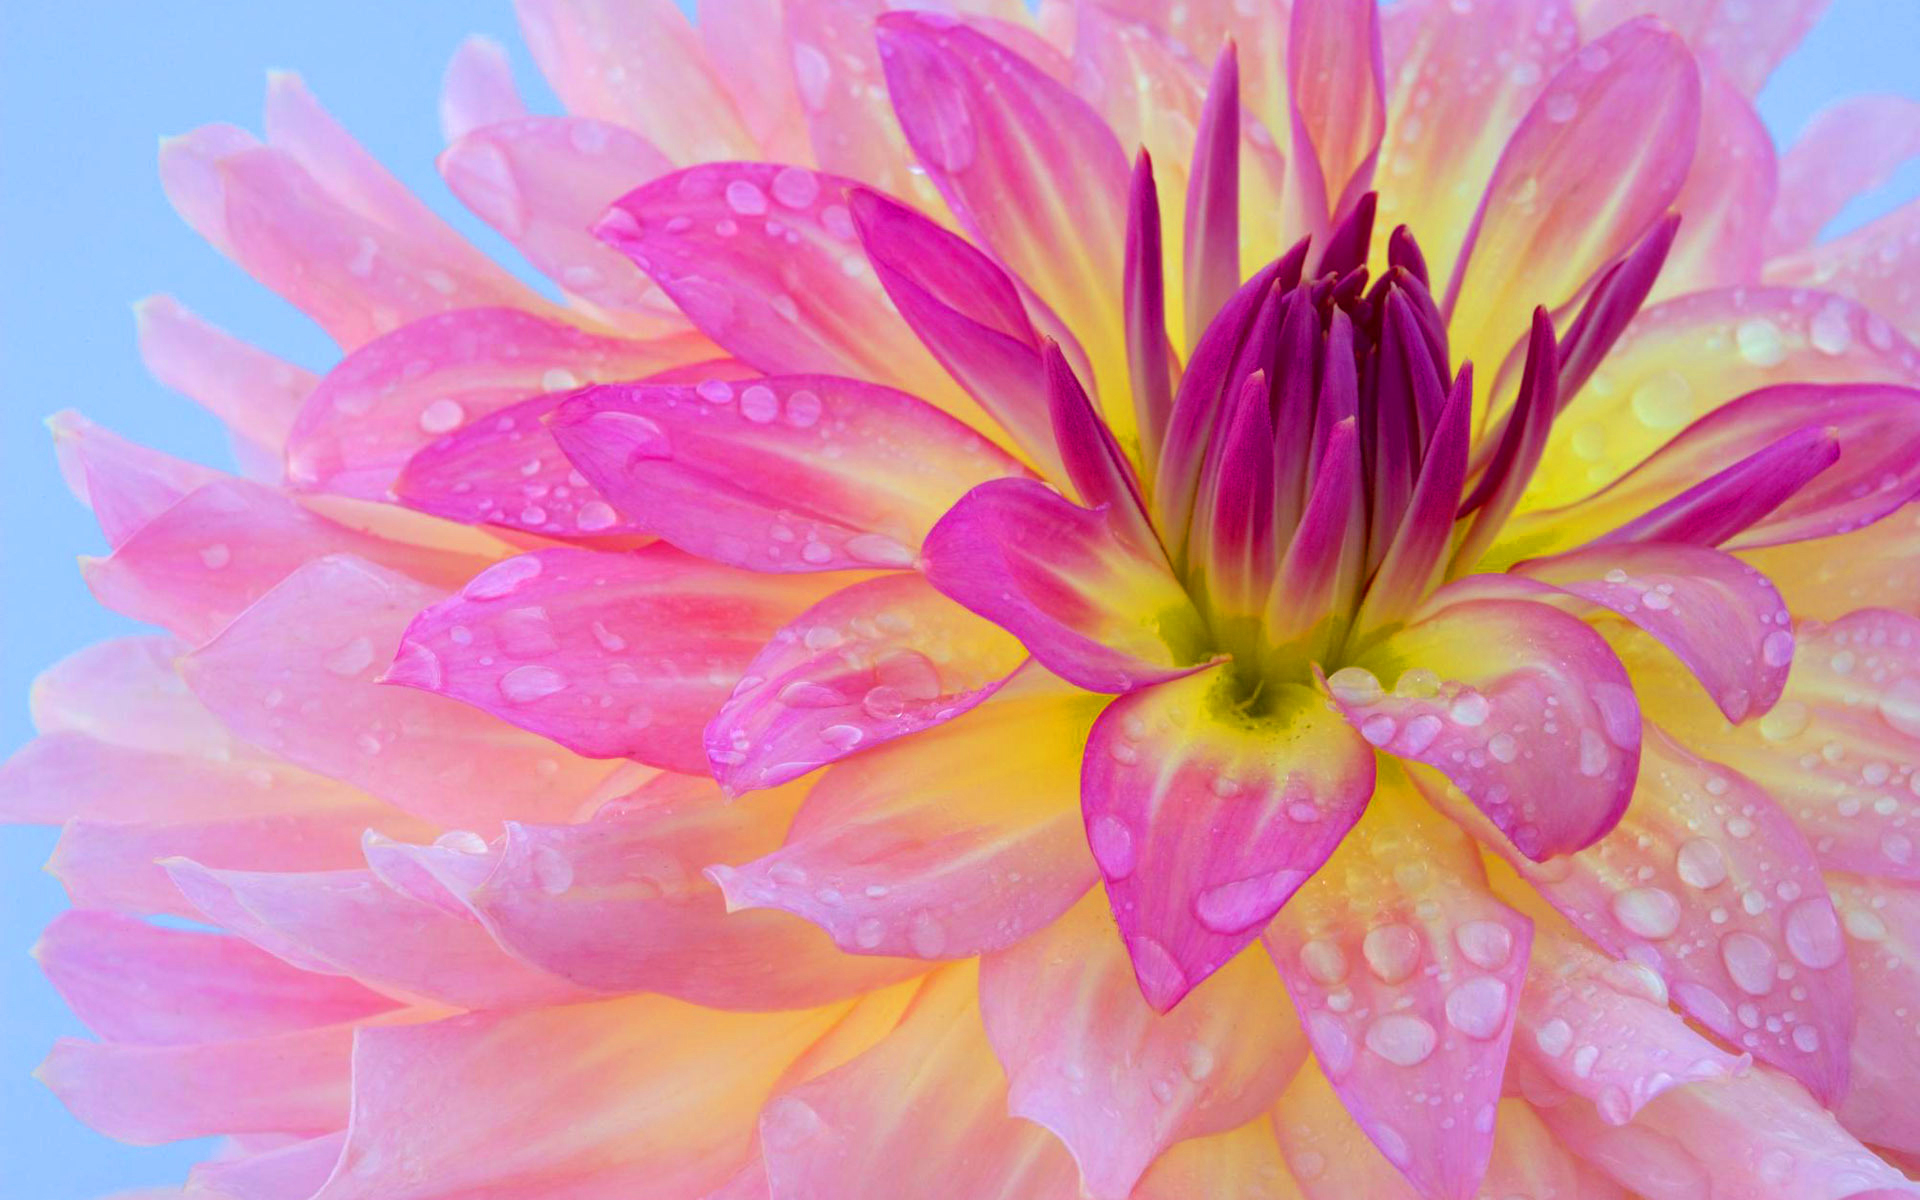 Pink flower morning dew